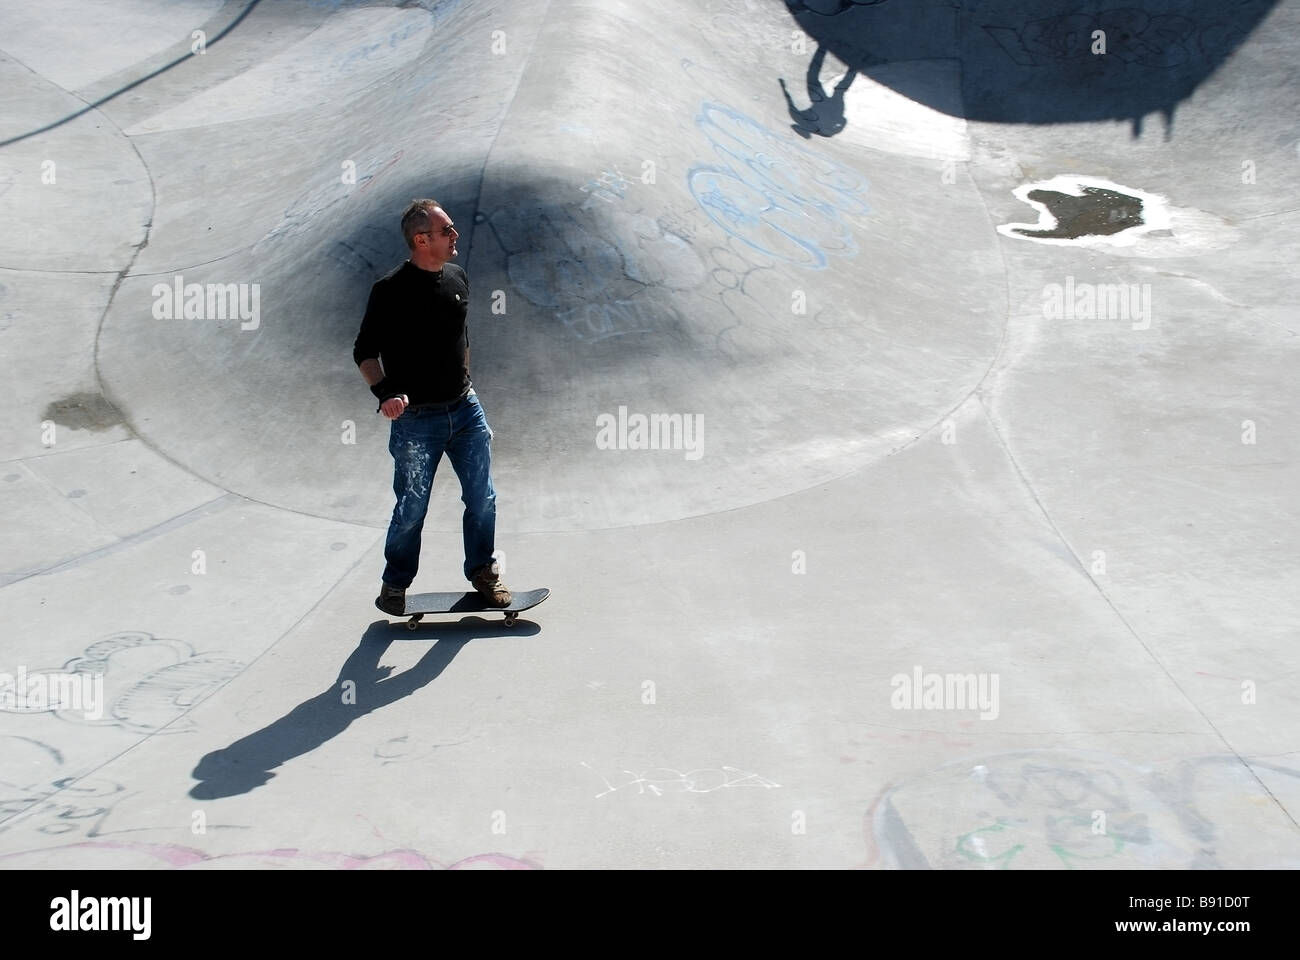 Skateboarder at Brixton playground - Stock Image